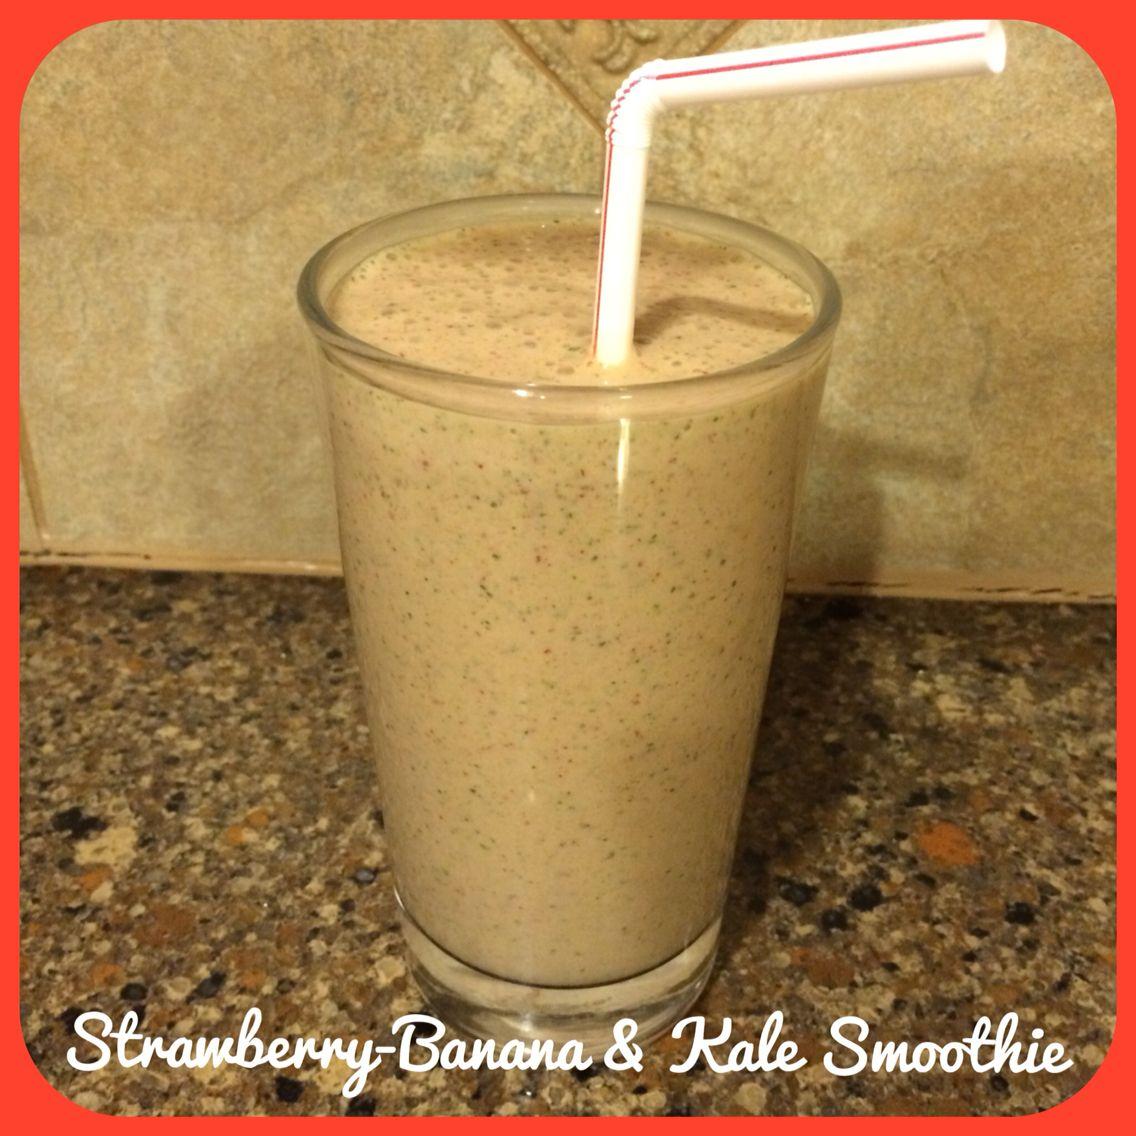 1/2 c skim milk 1/2 c plain, nonfat Greek yogurt 2/3 c kale greens, packed 2/3 c frozen, whole strawberries 1 medium, ripe banana 1.5 tbsp blue agave nectar 1 tbsp ground flaxseed meal (optional) Blend until liquified.  Enjoy.  Makes 1 large smoothie.